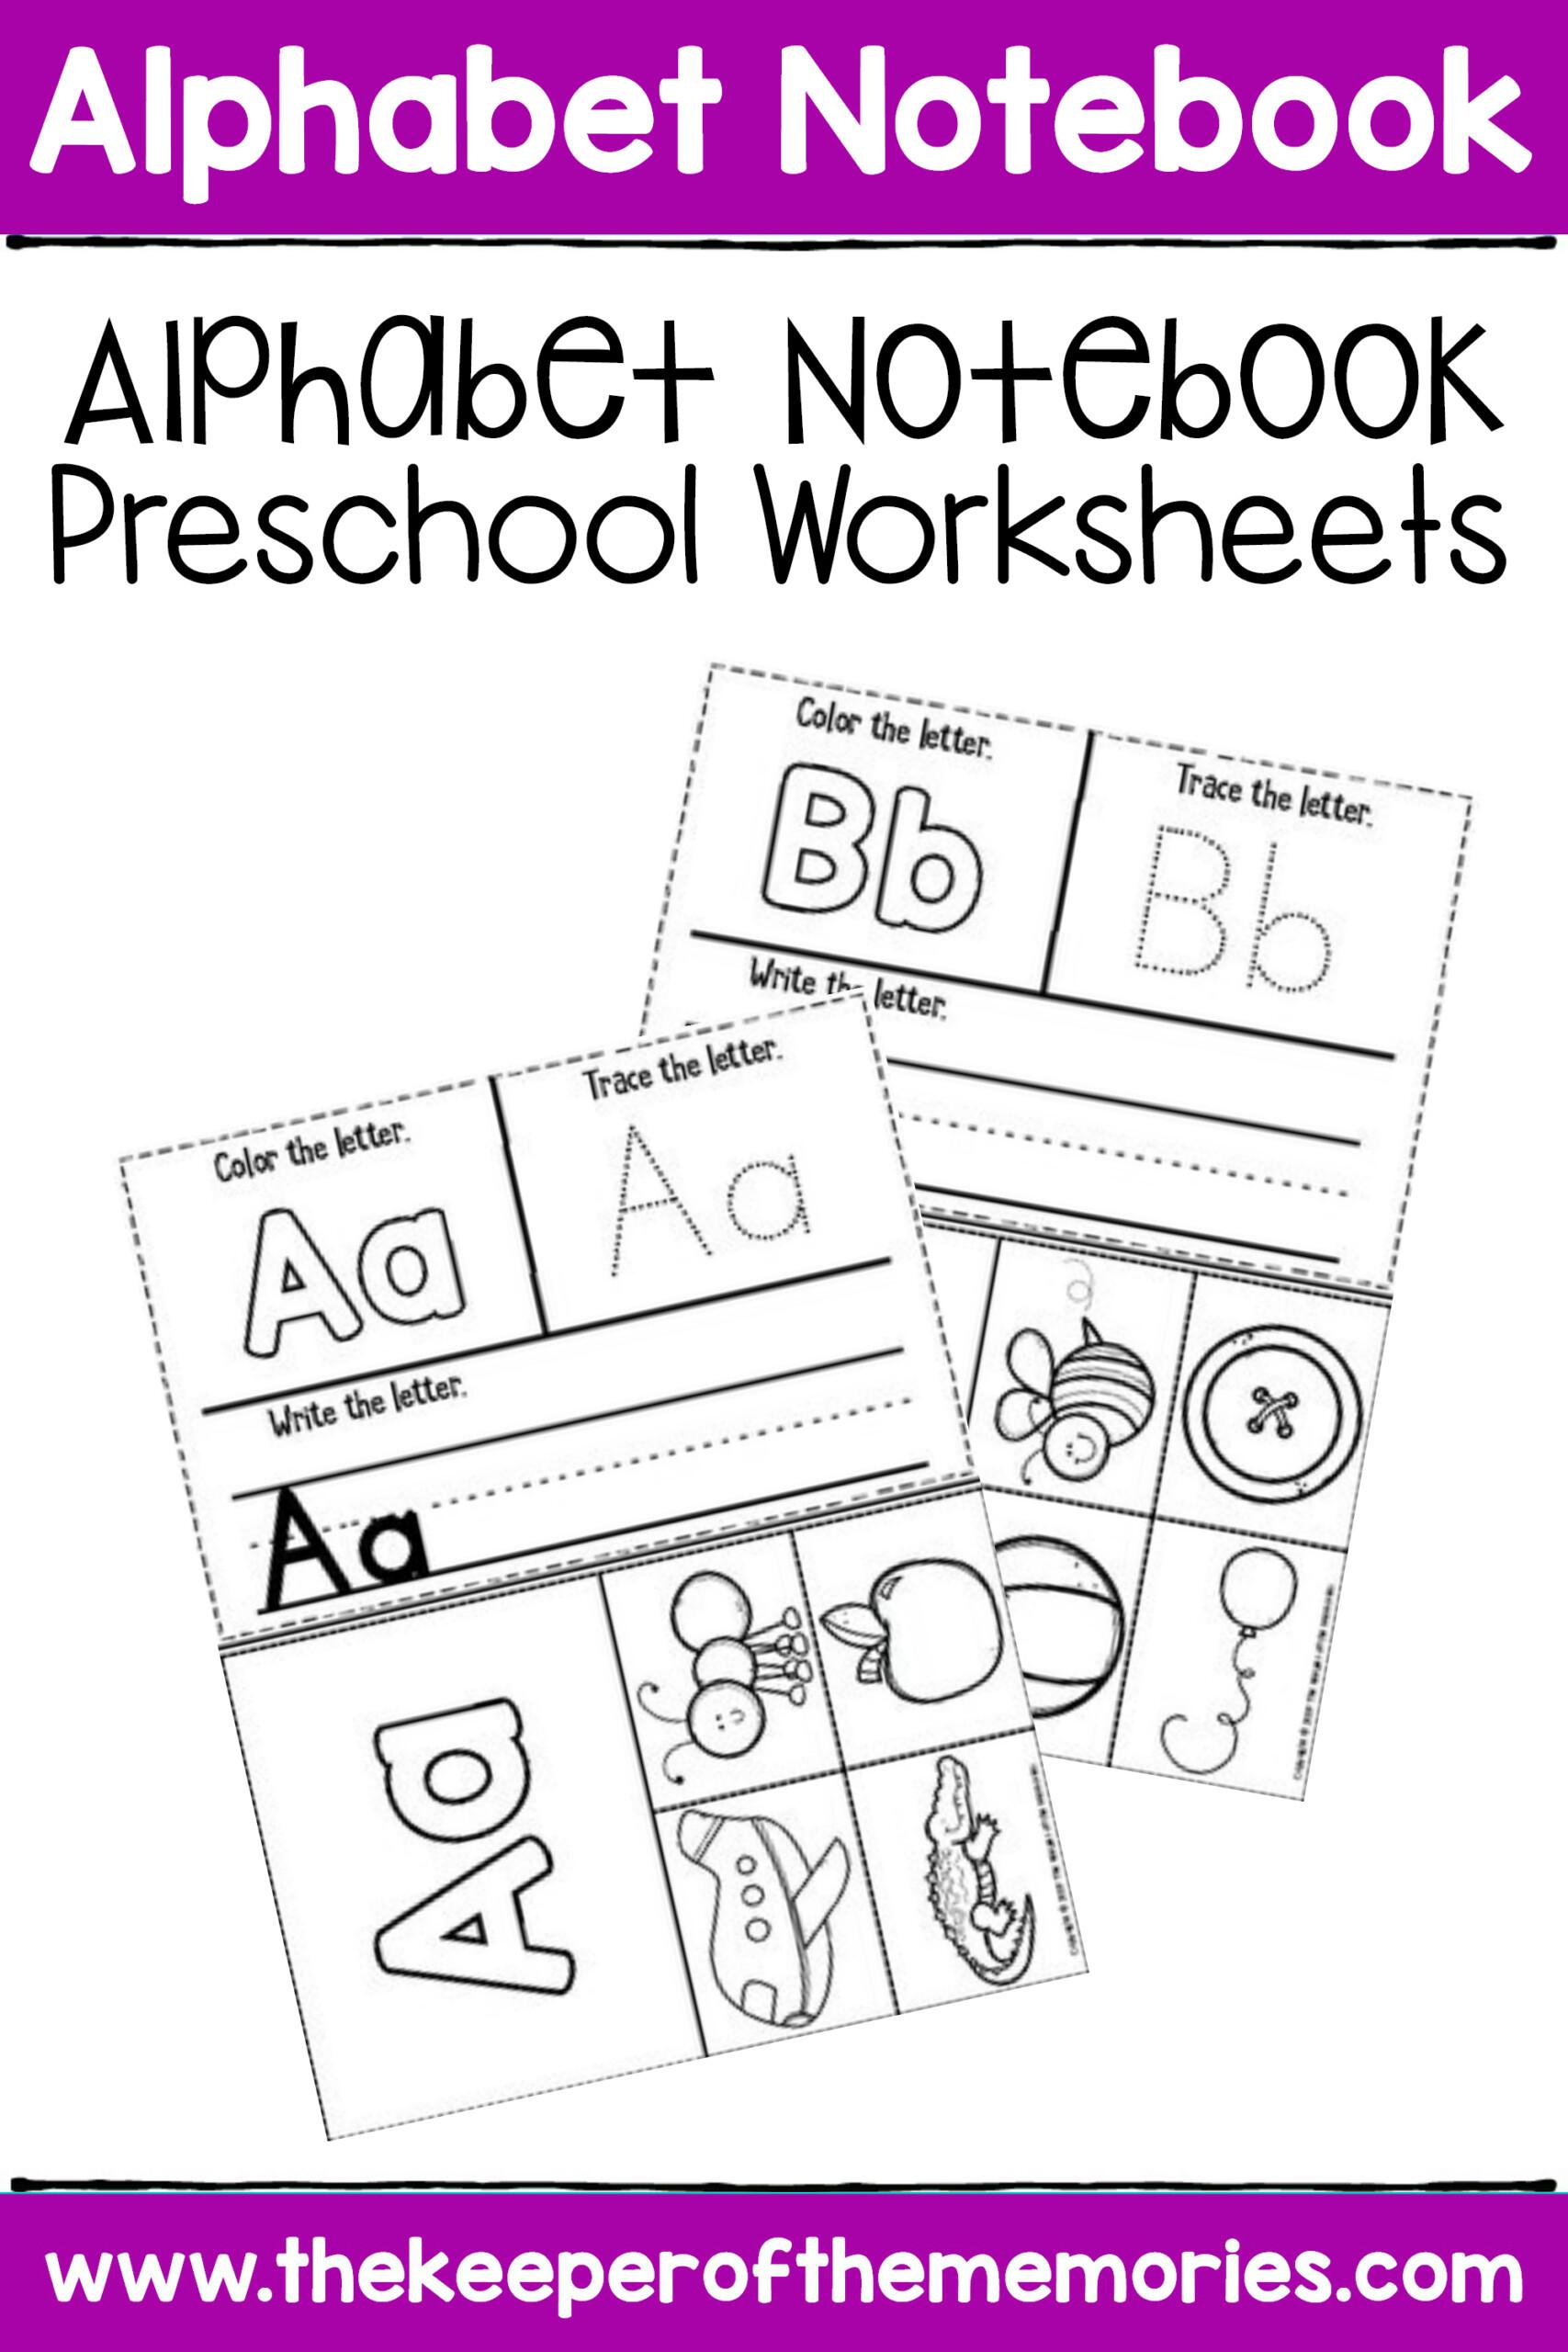 Free Printable Alphabet Notebook Preschool Worksheets